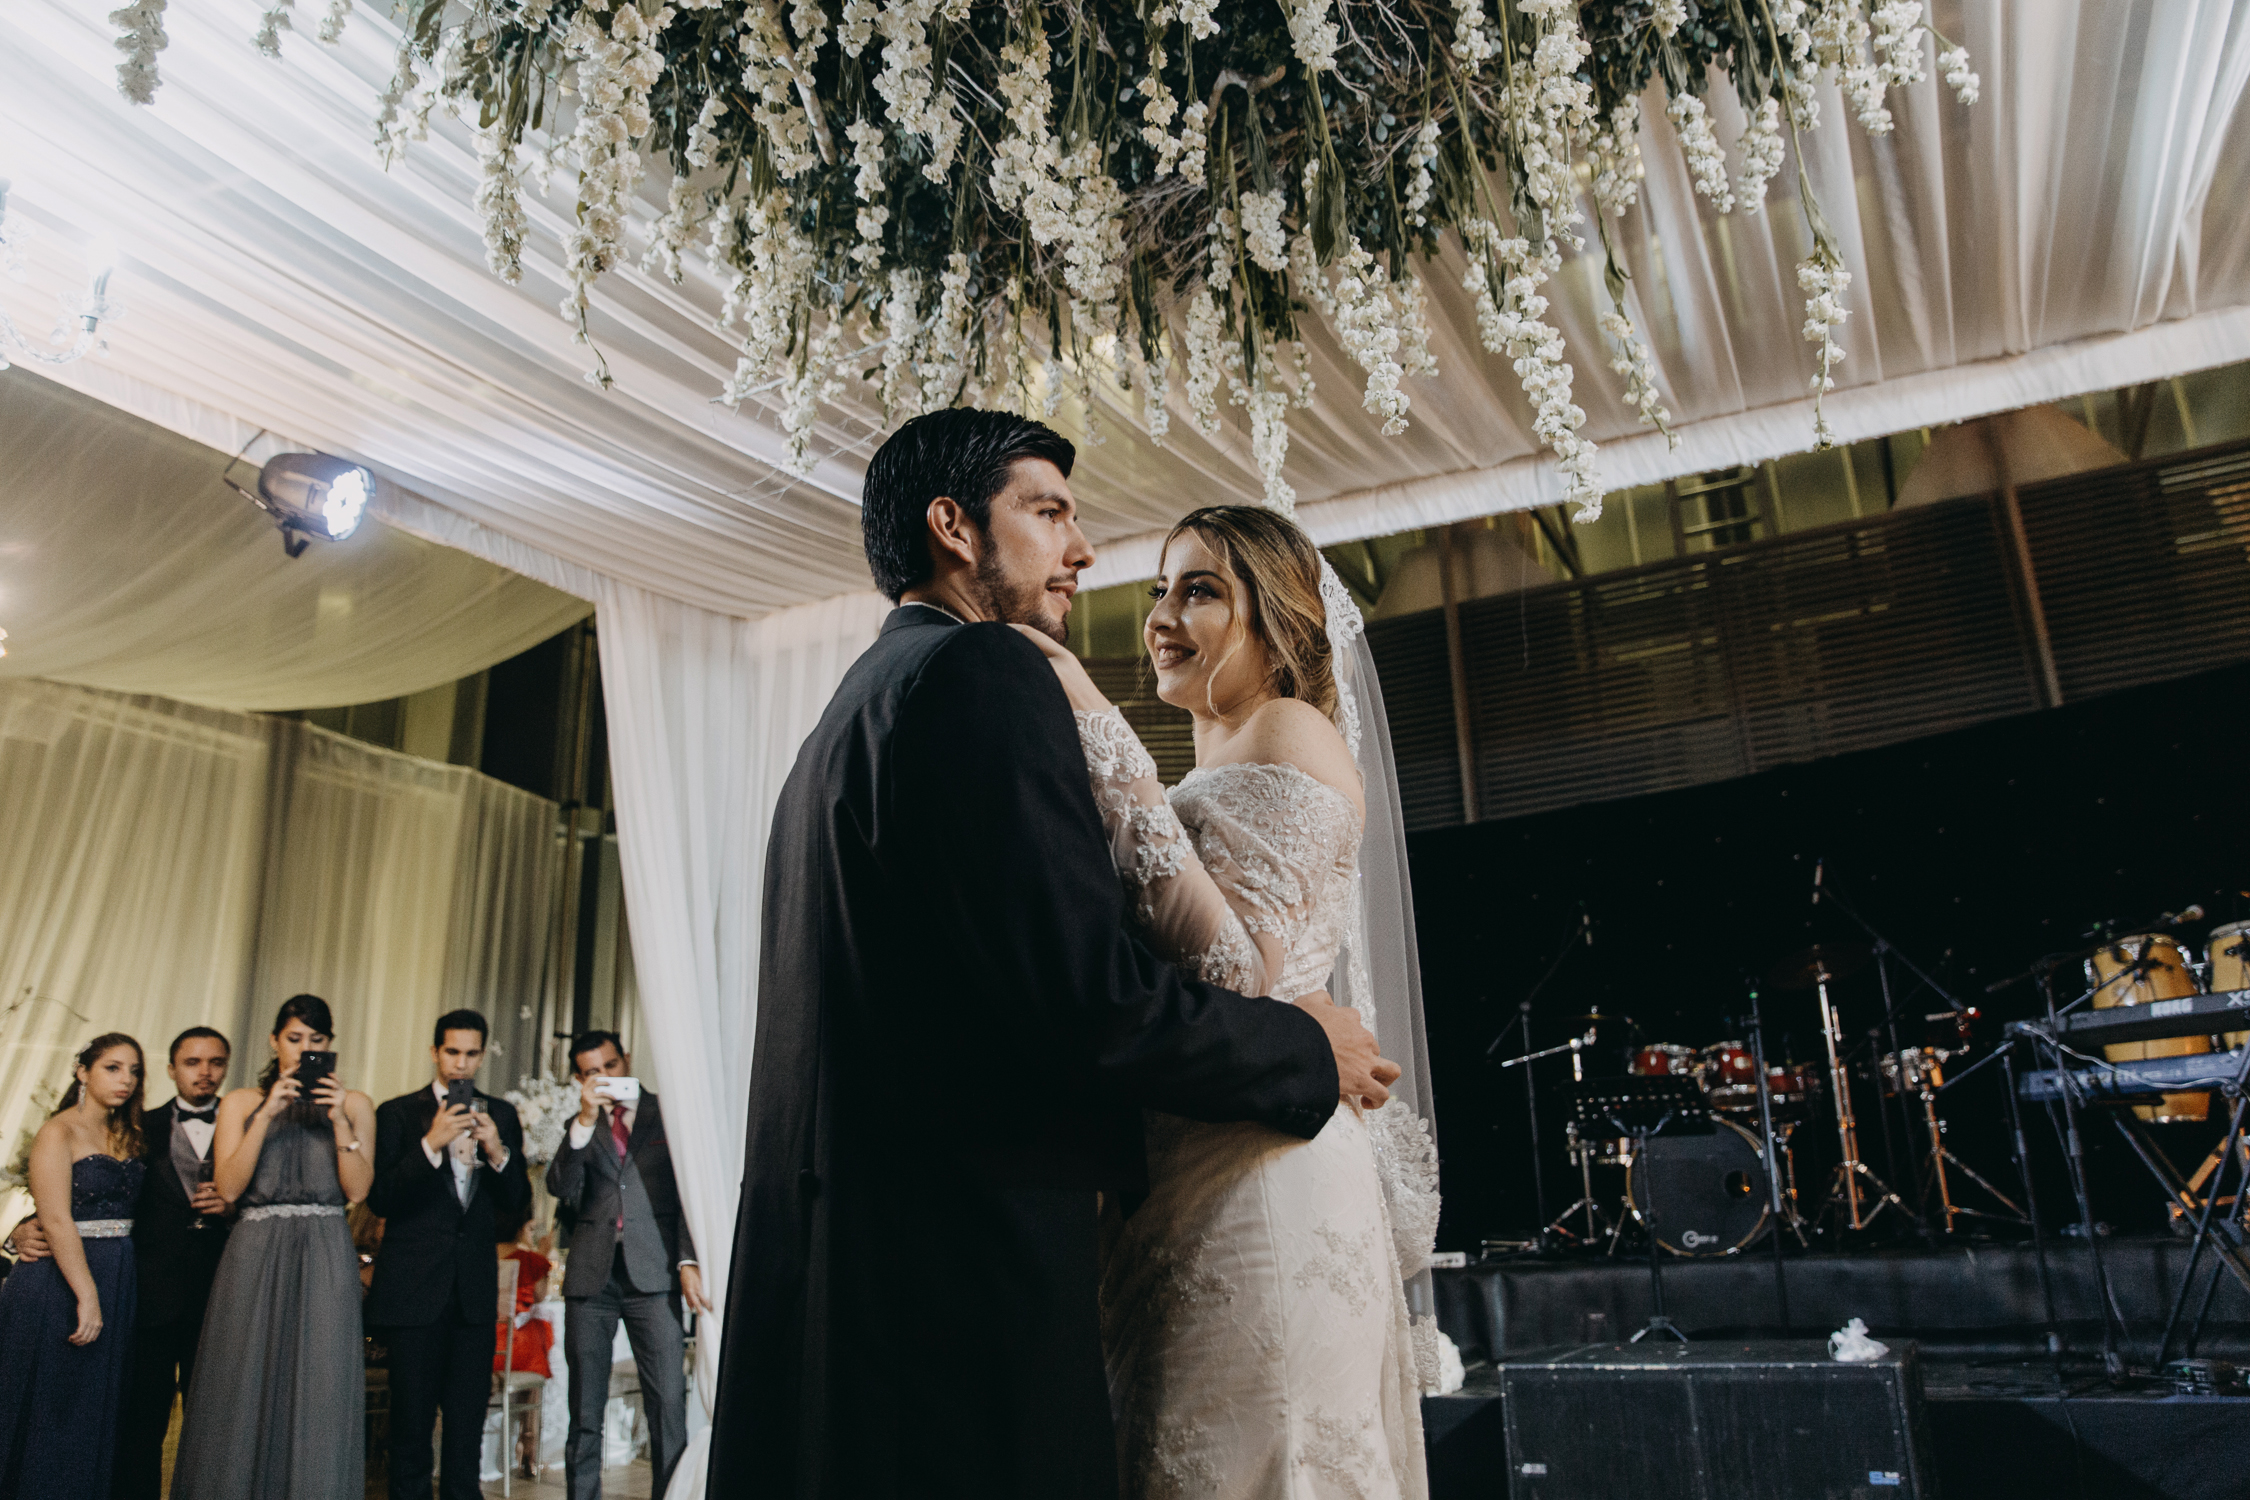 Michelle-Agurto-Fotografia-Bodas-Ecuador-Destination-Wedding-Photographer-Vicky-Javier-146.JPG